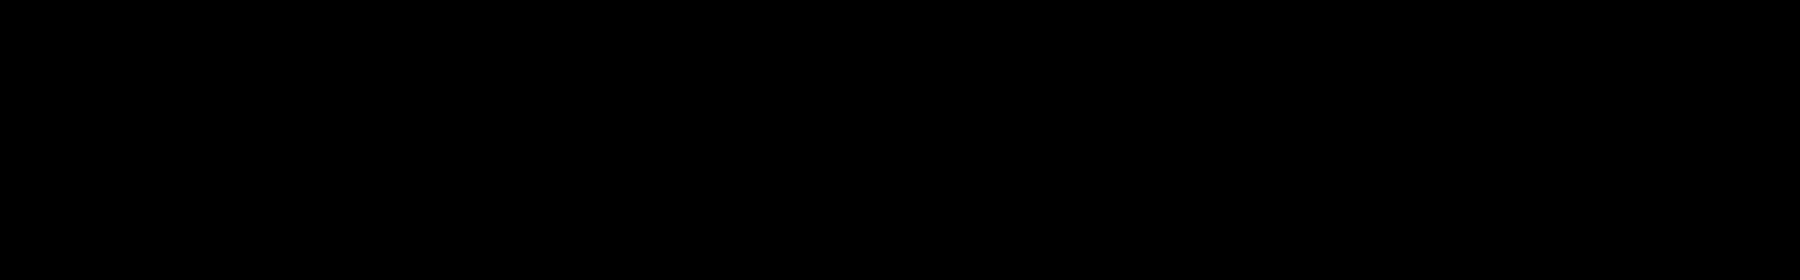 SIXNINE audio waveform